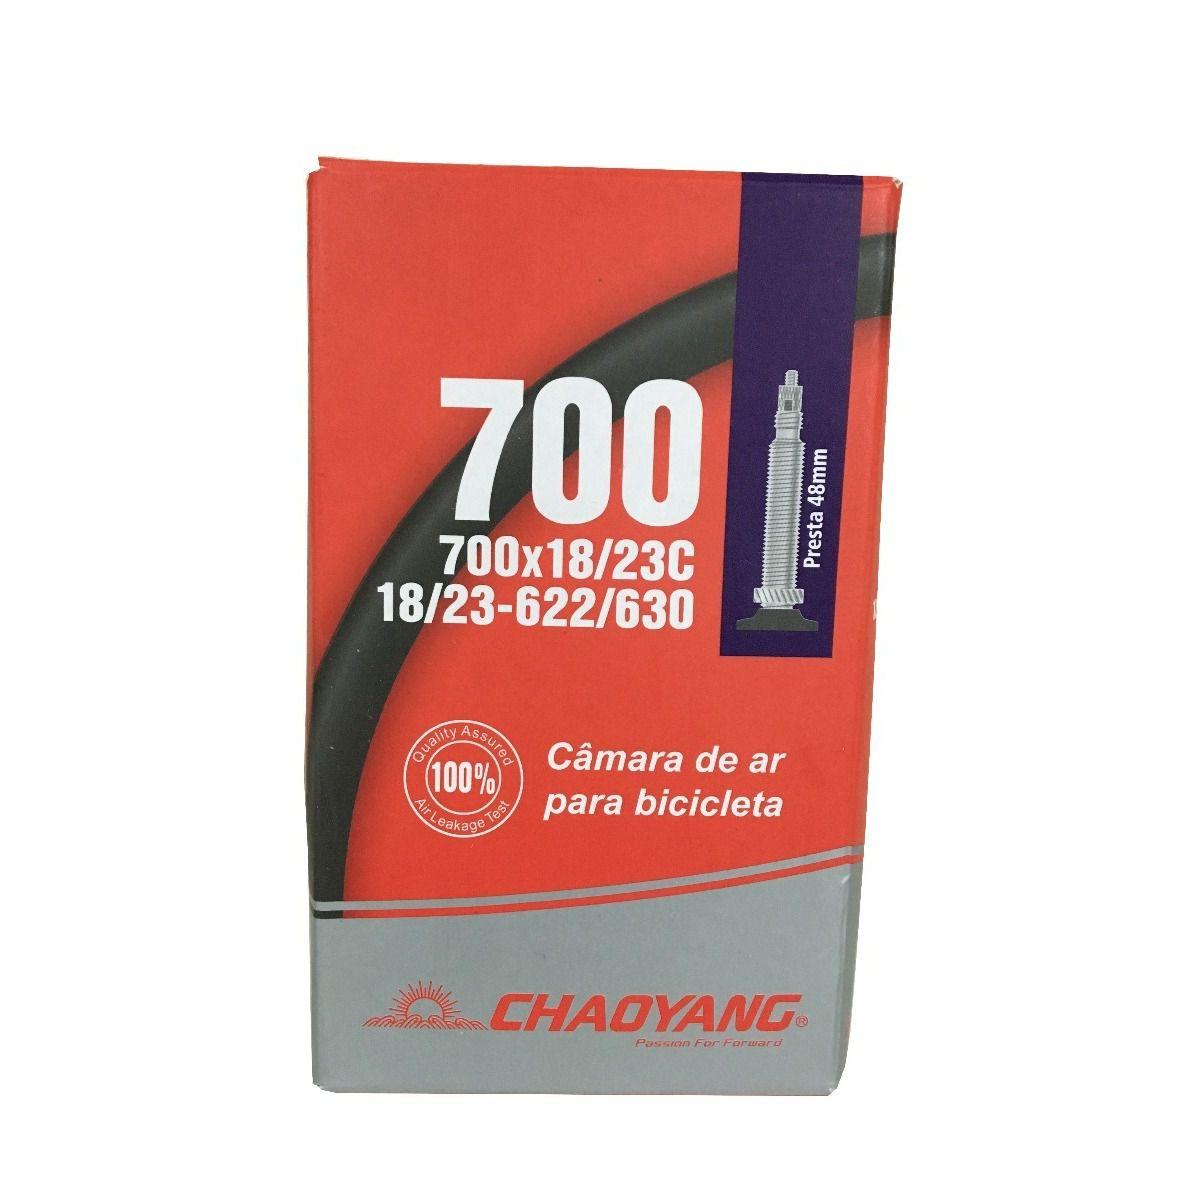 Câmara De Ar Chaoyang Speed 700x18/23c - Válvula Presta 48mm